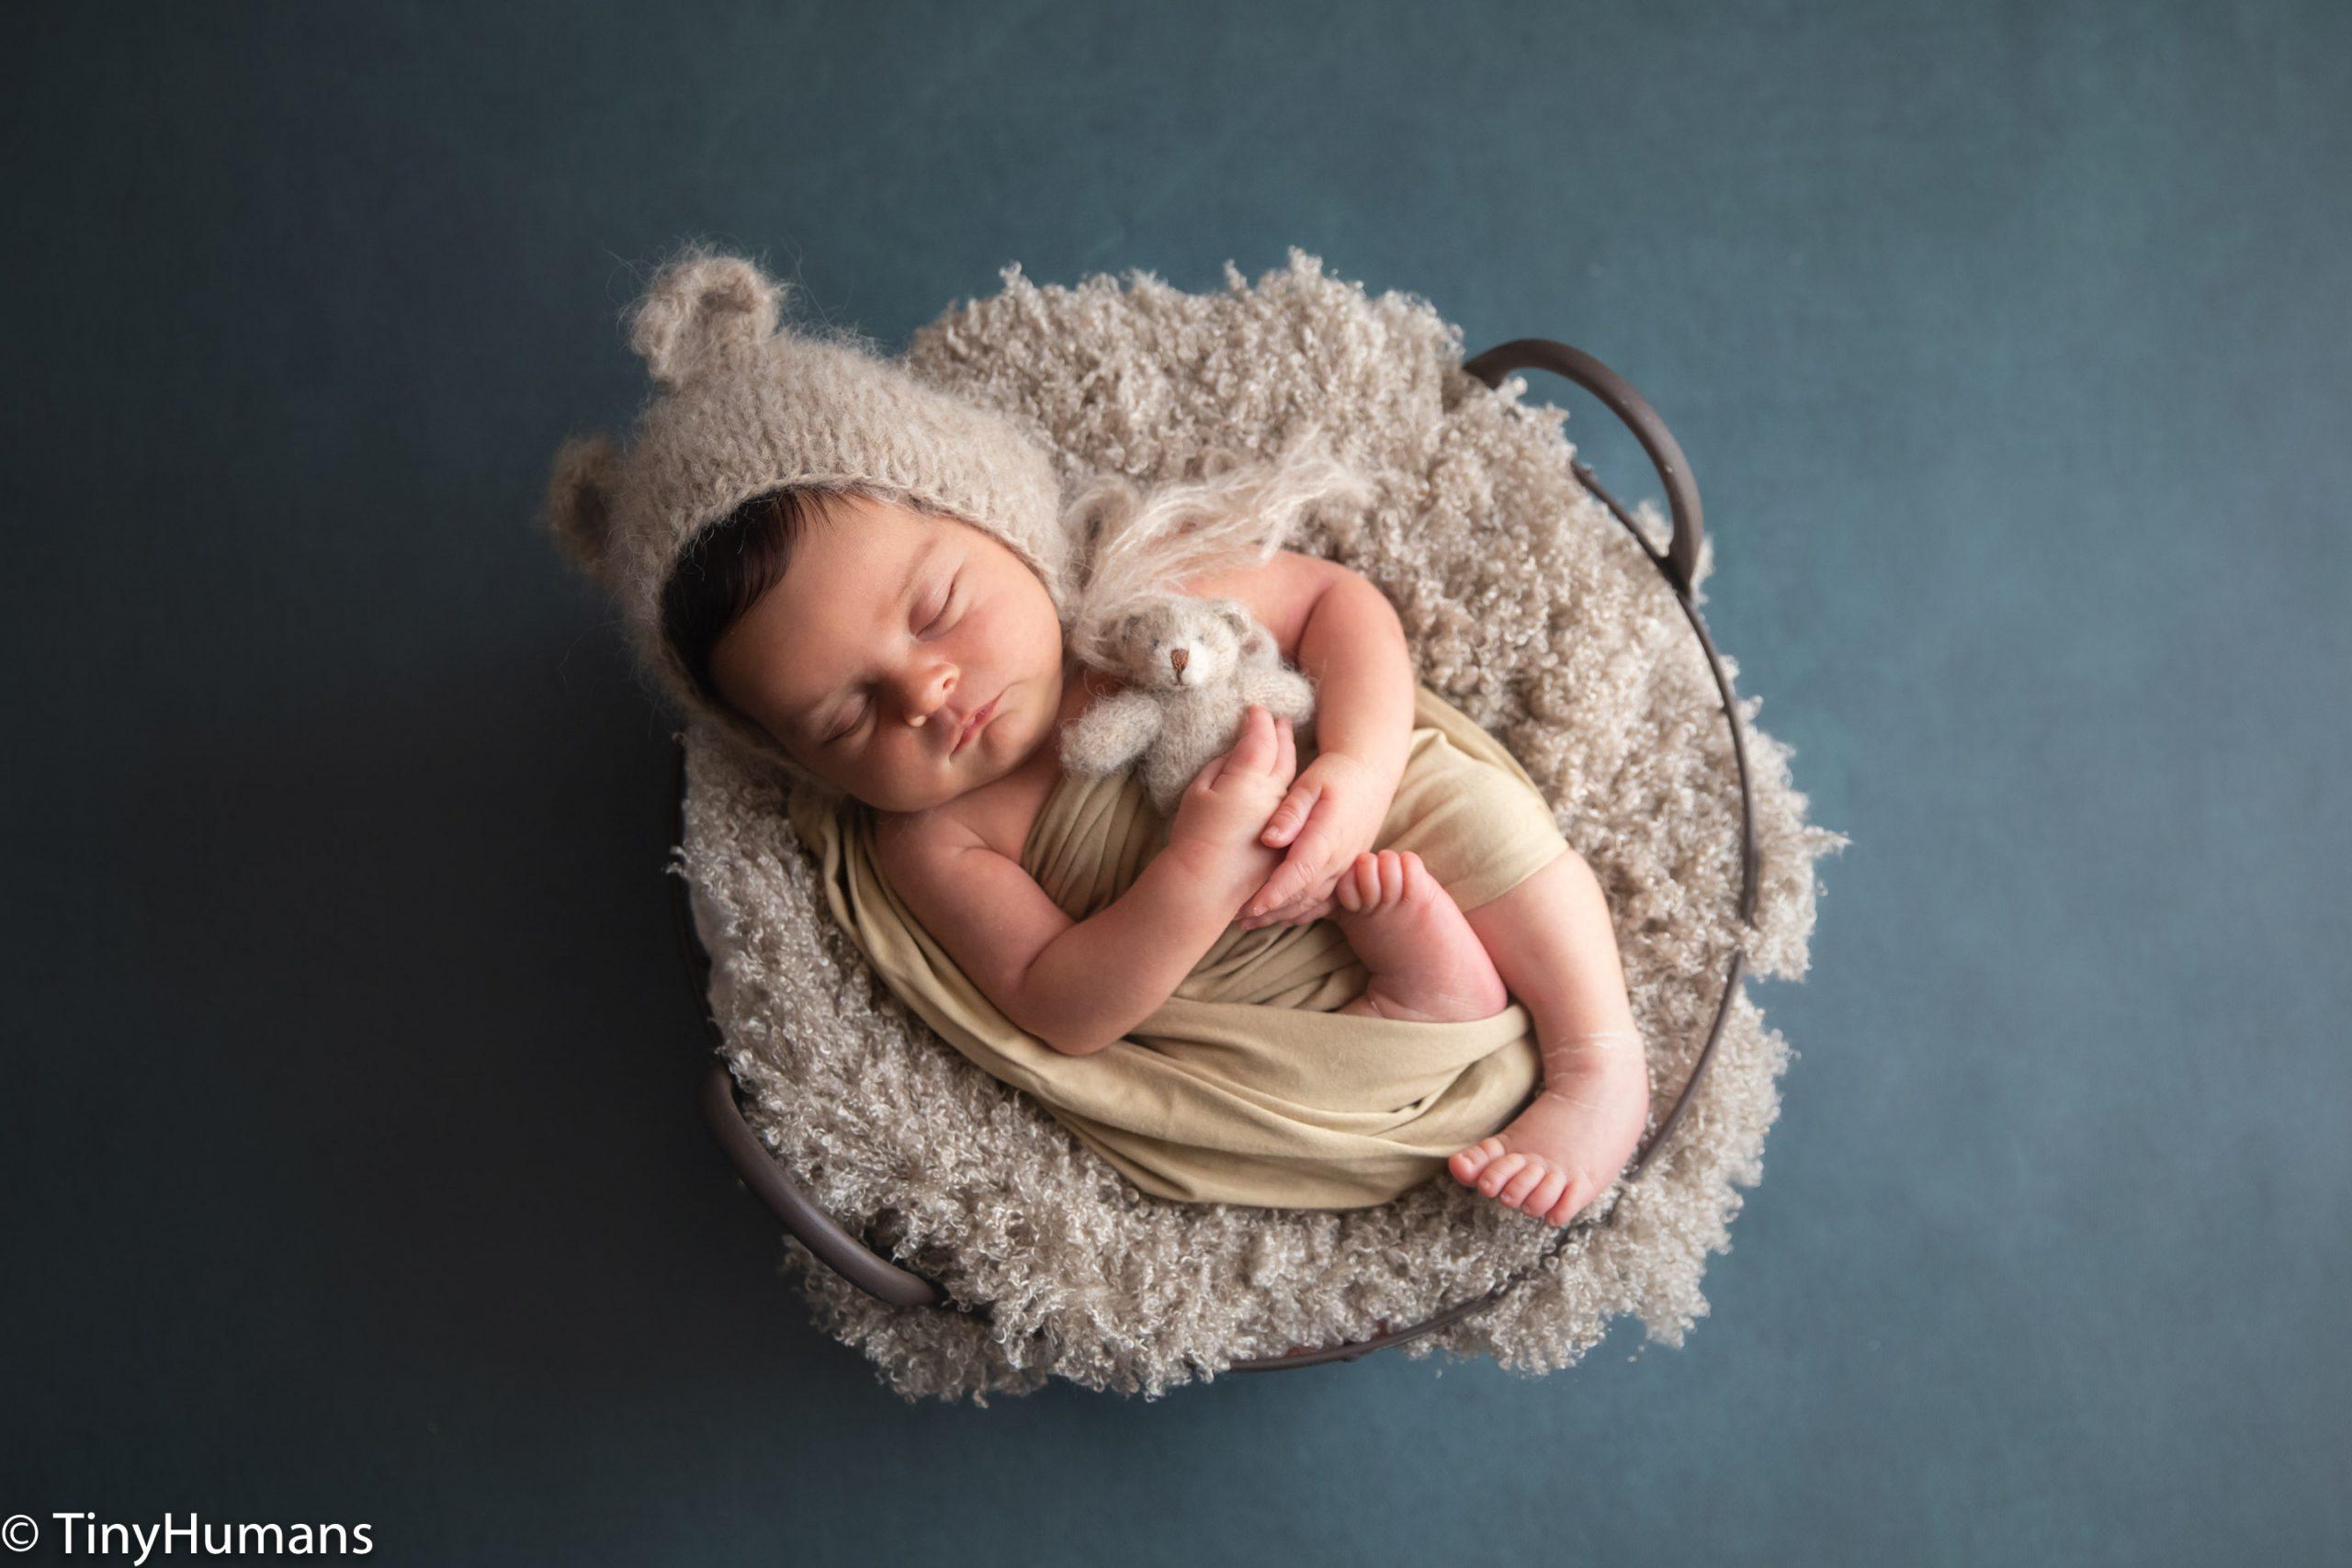 Sleeping newborn with teddy bear